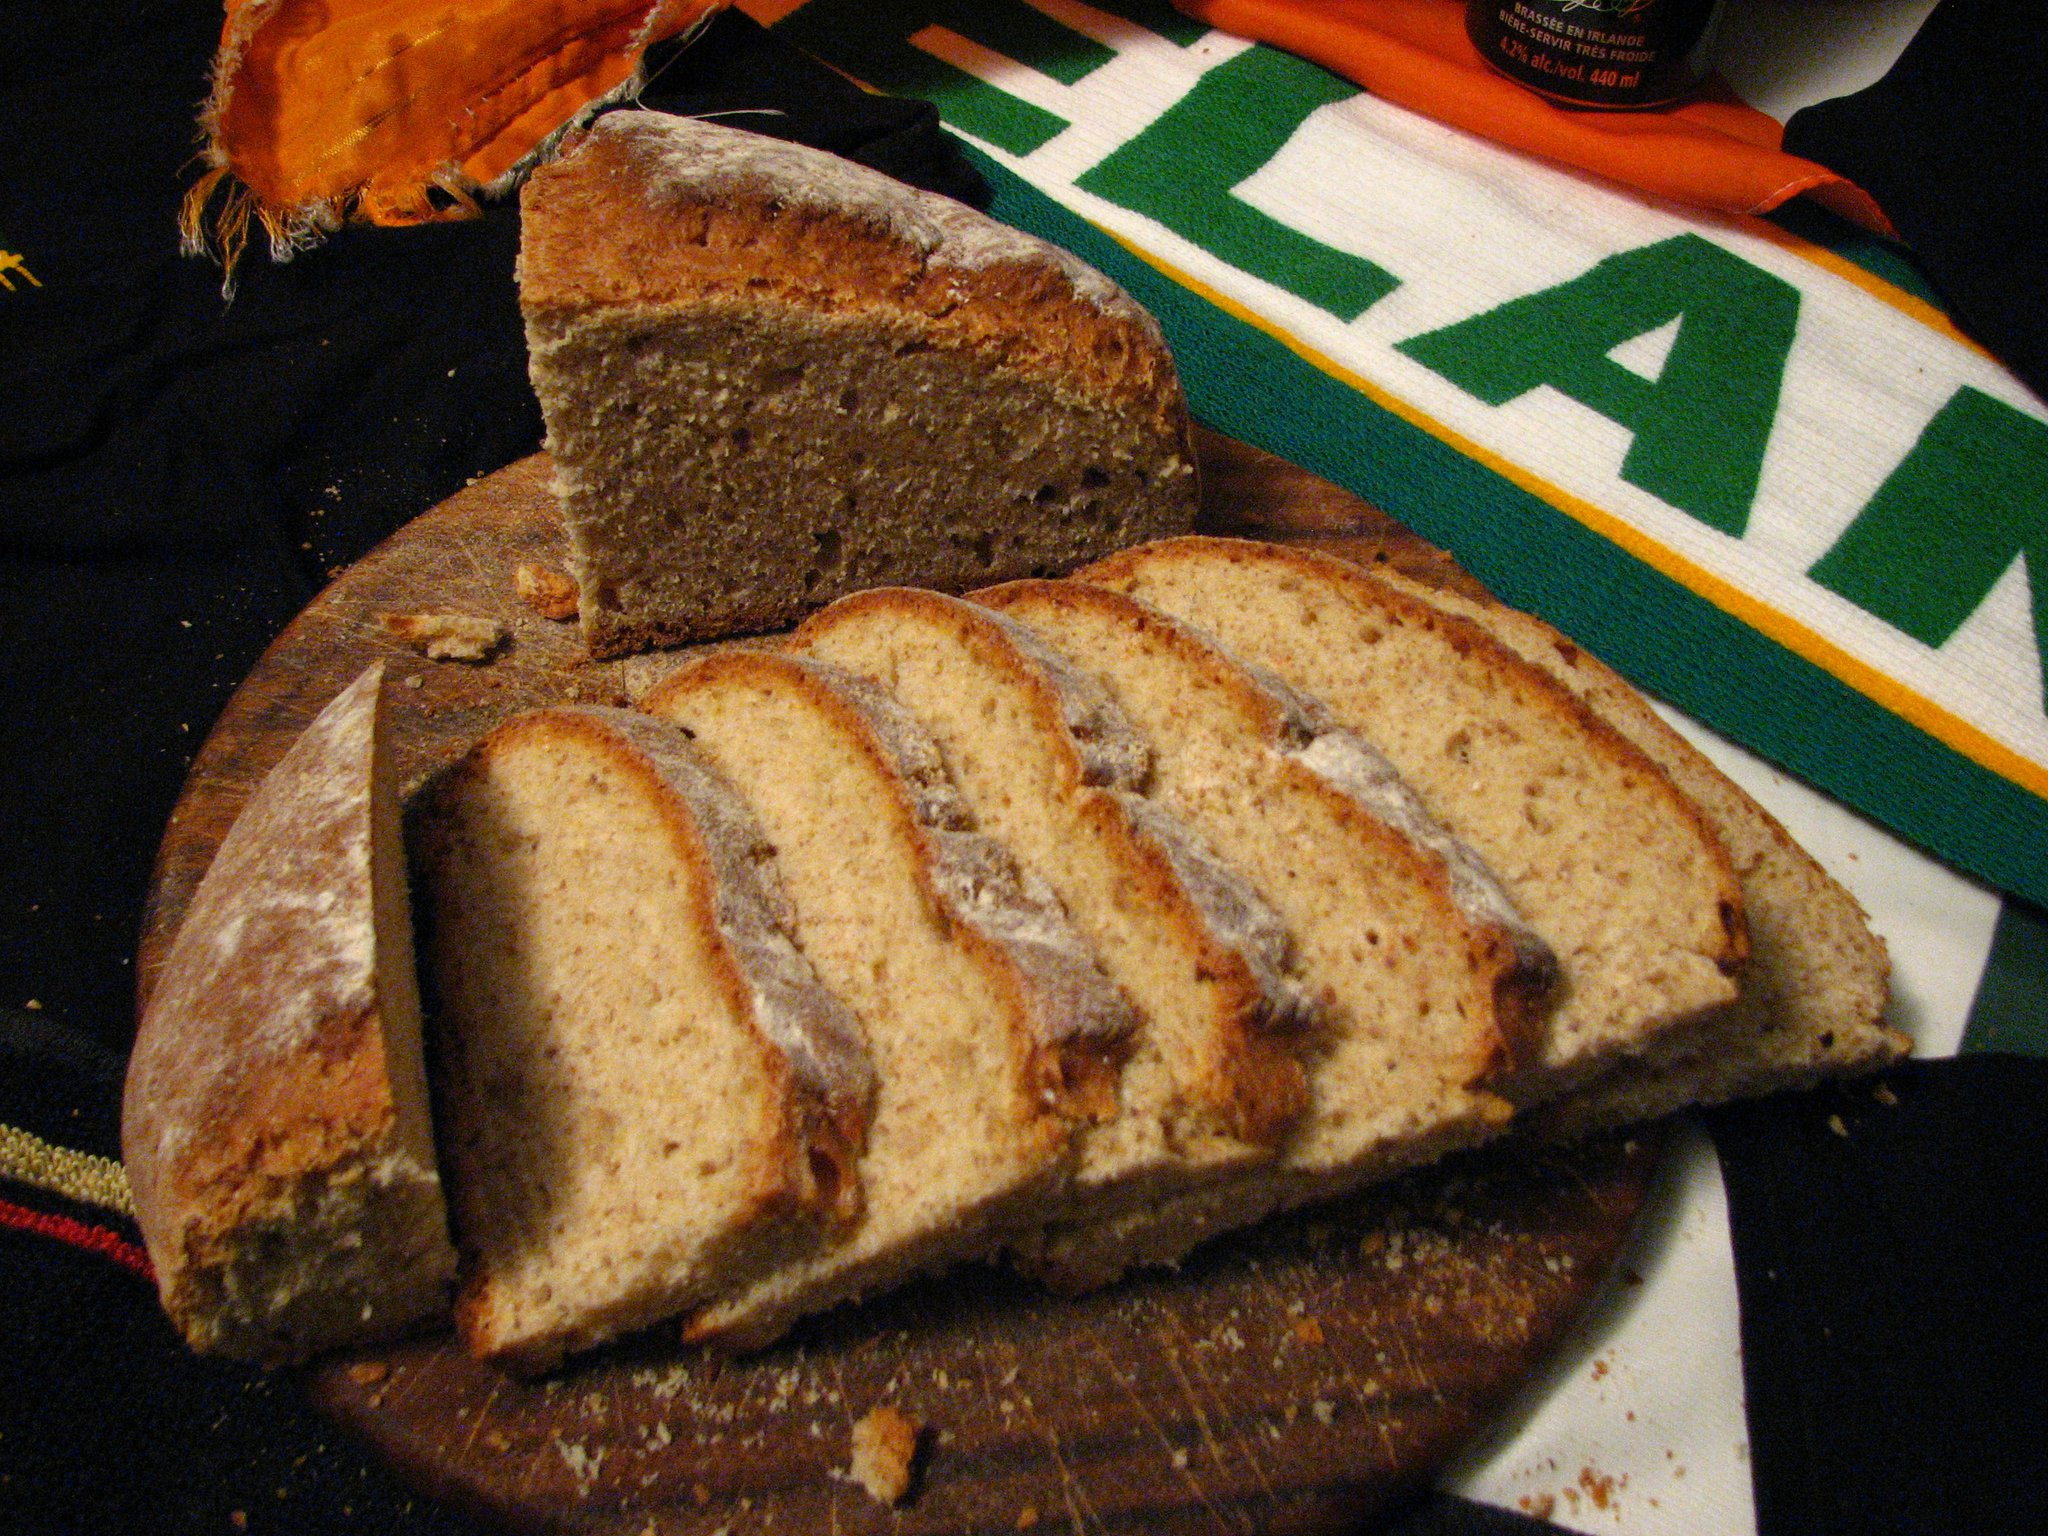 Irish Soda Bread In Mississauga at the Irish Bread Store. Gaelic Sports Teams love our IRISH SODA BREAD and DESSERT LOAF